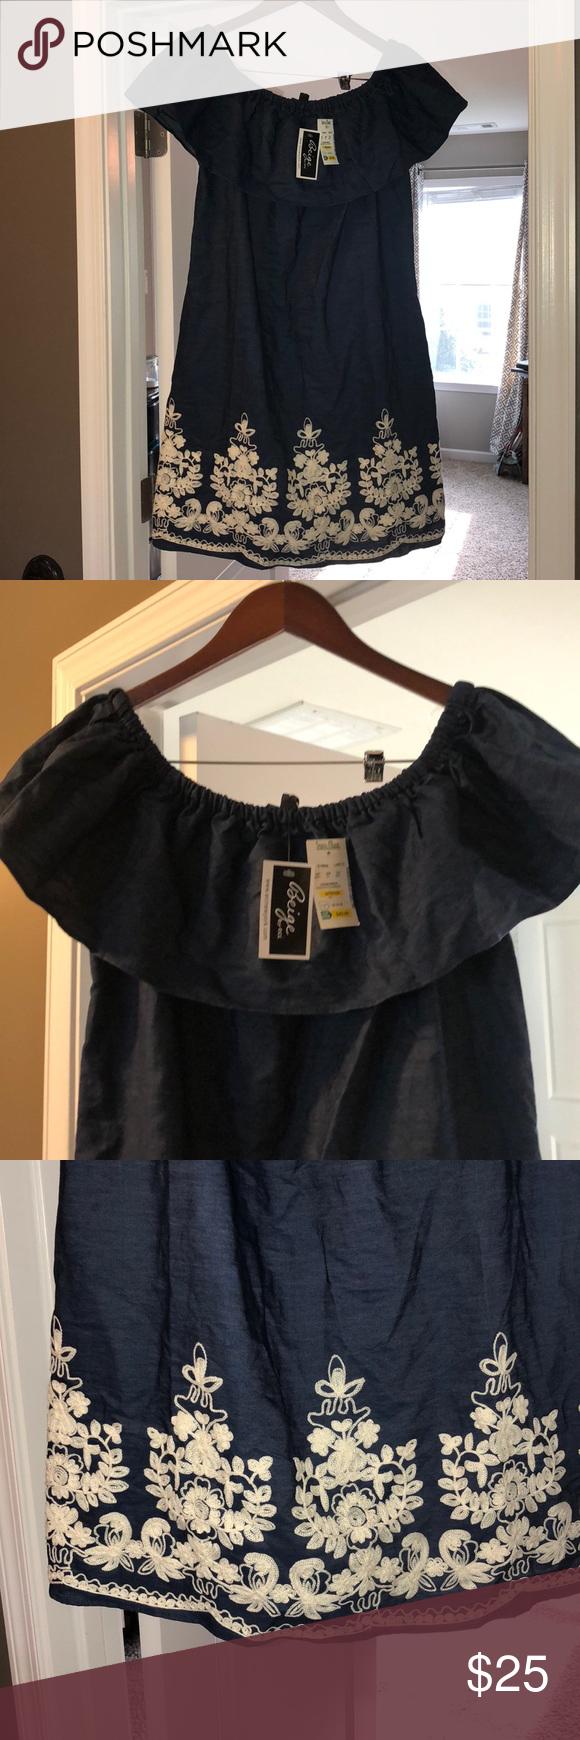 New Beige Denim Dress Denim Dress Stein Mart Dresses Clothes Design [ 1740 x 580 Pixel ]